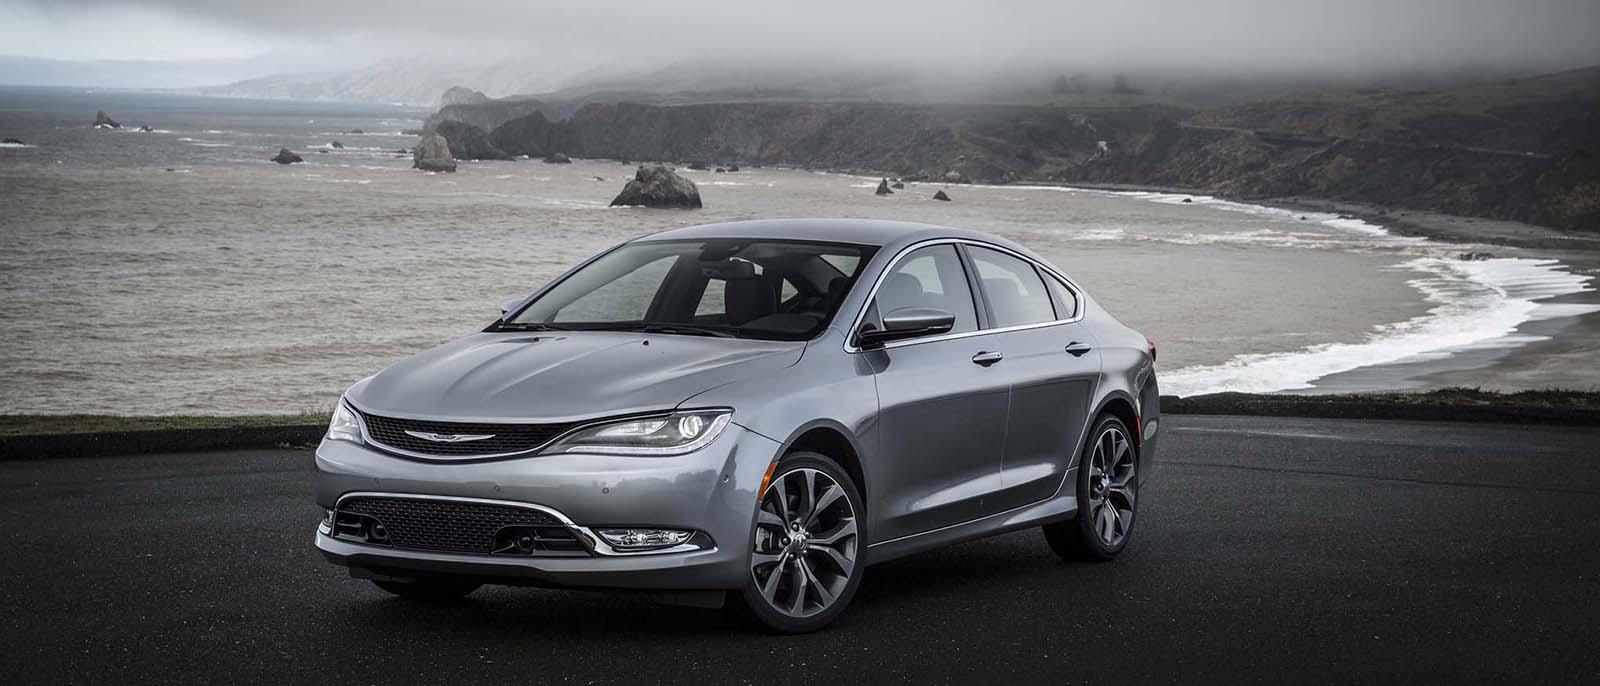 2017 Chrysler 200 Beach